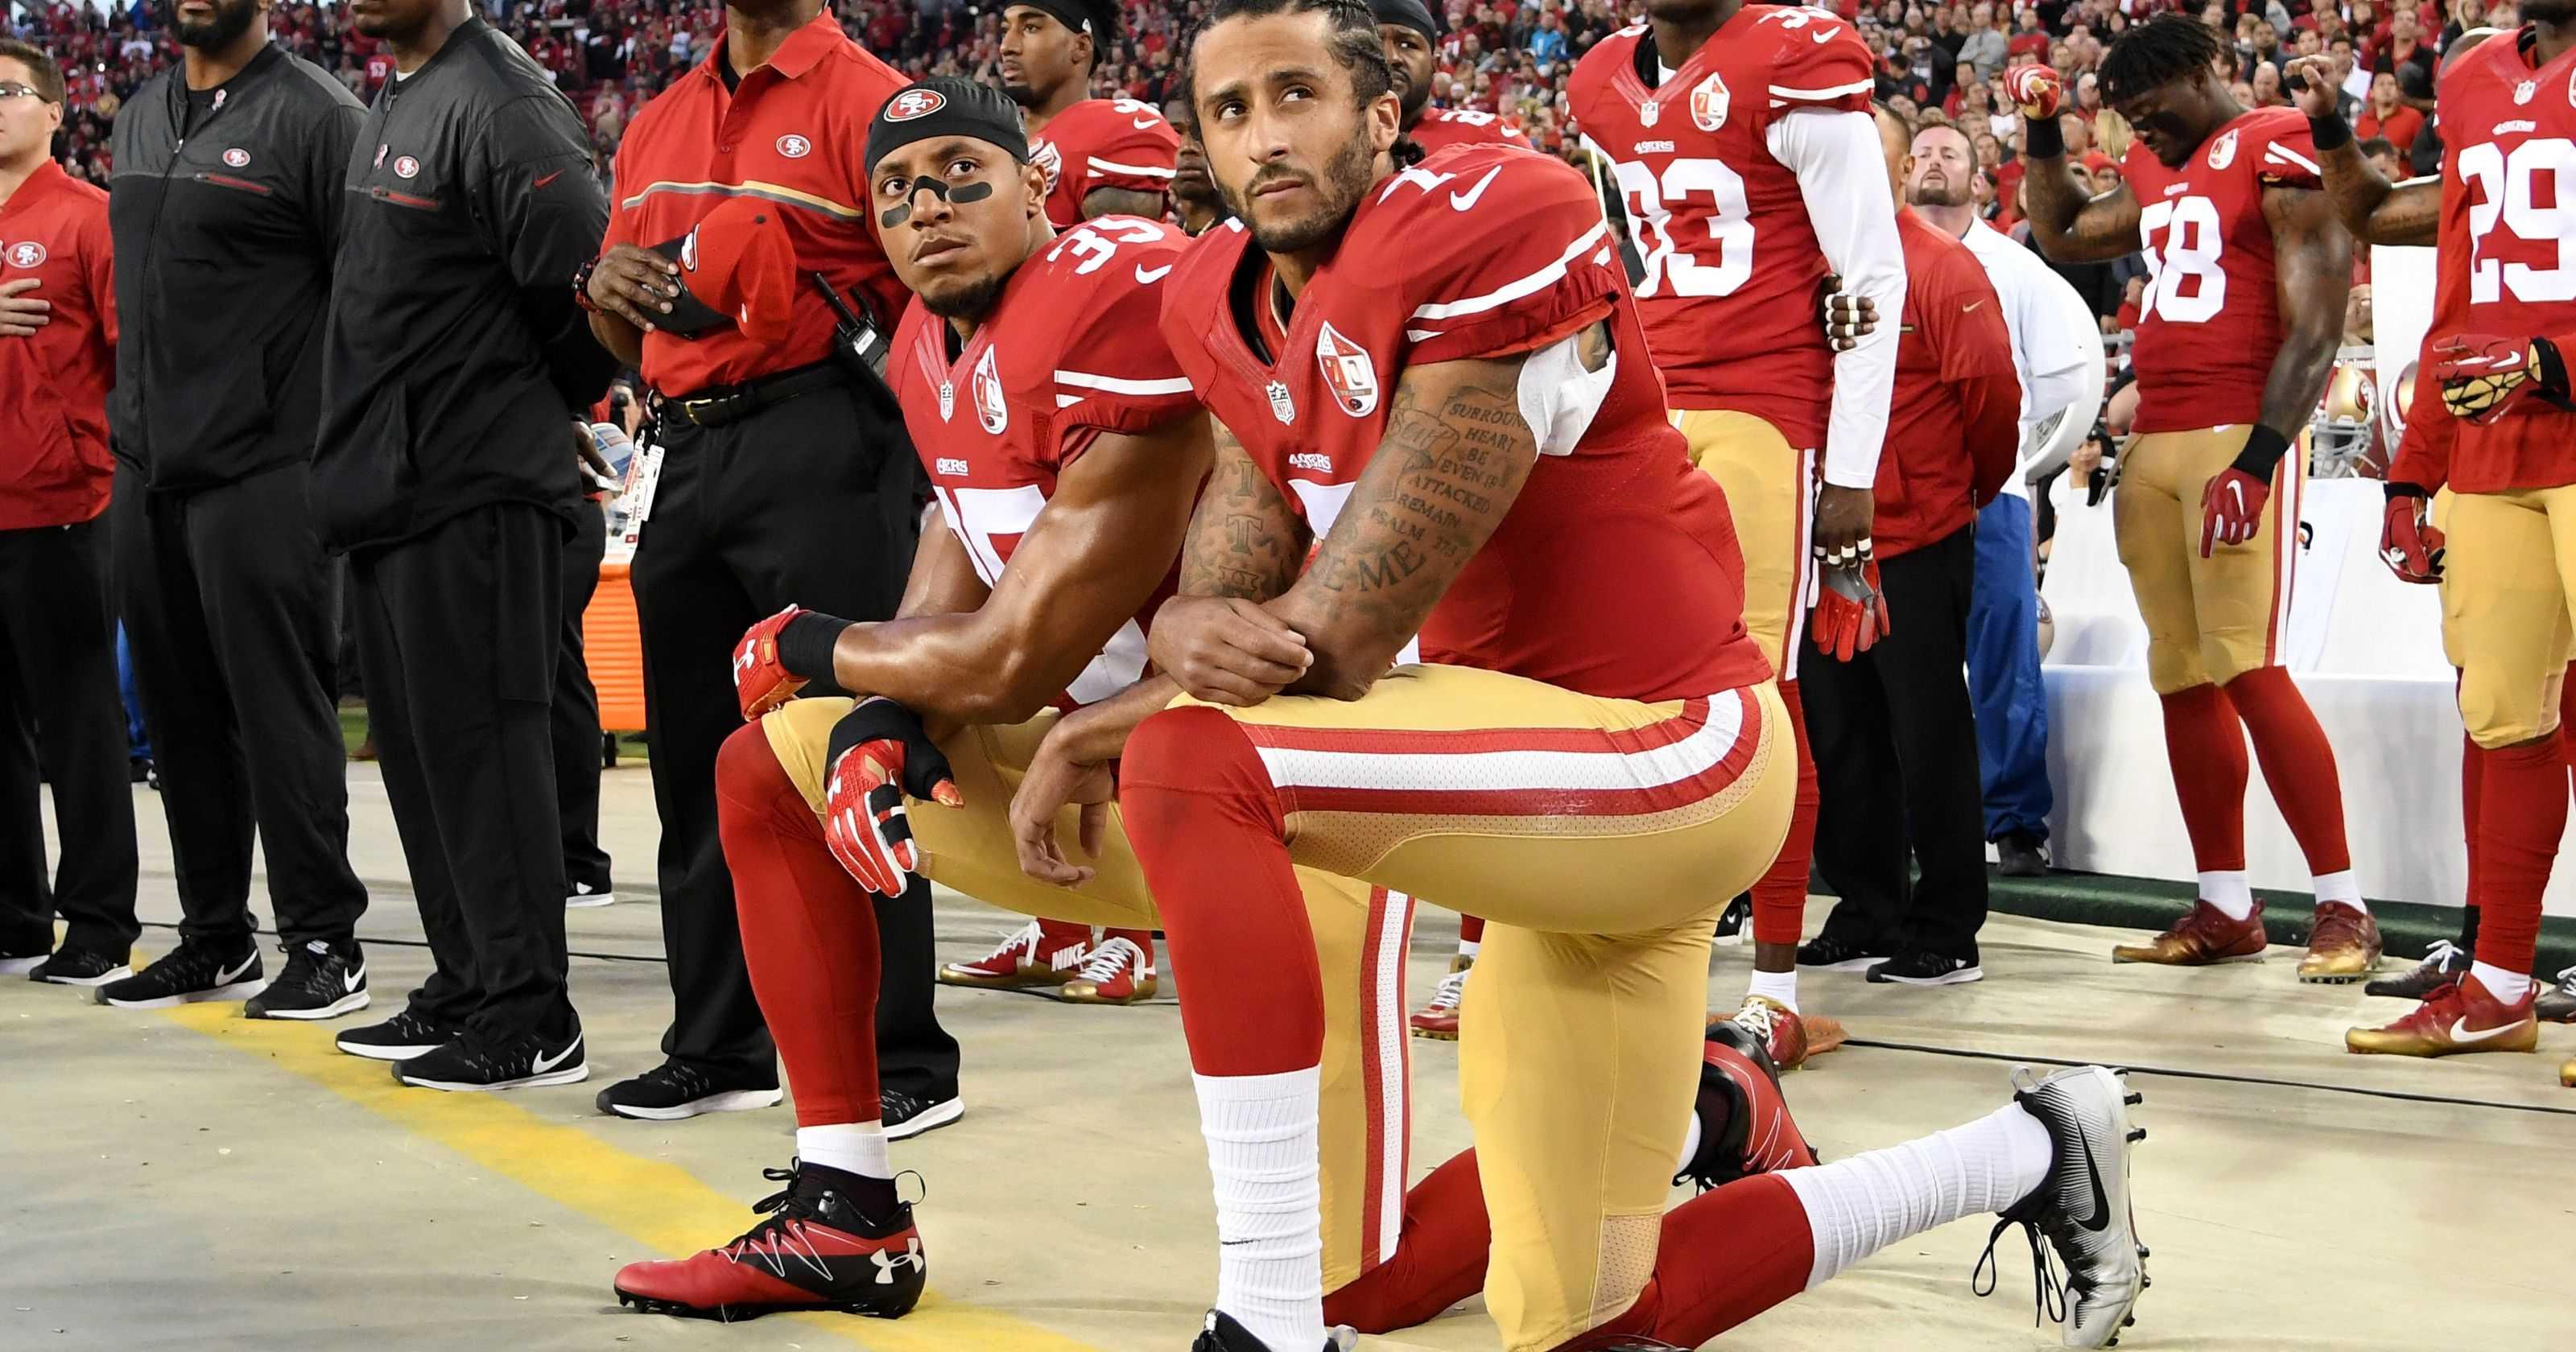 Colin Kaepernick kneeling alongside Eric Reid during the National Anthem.